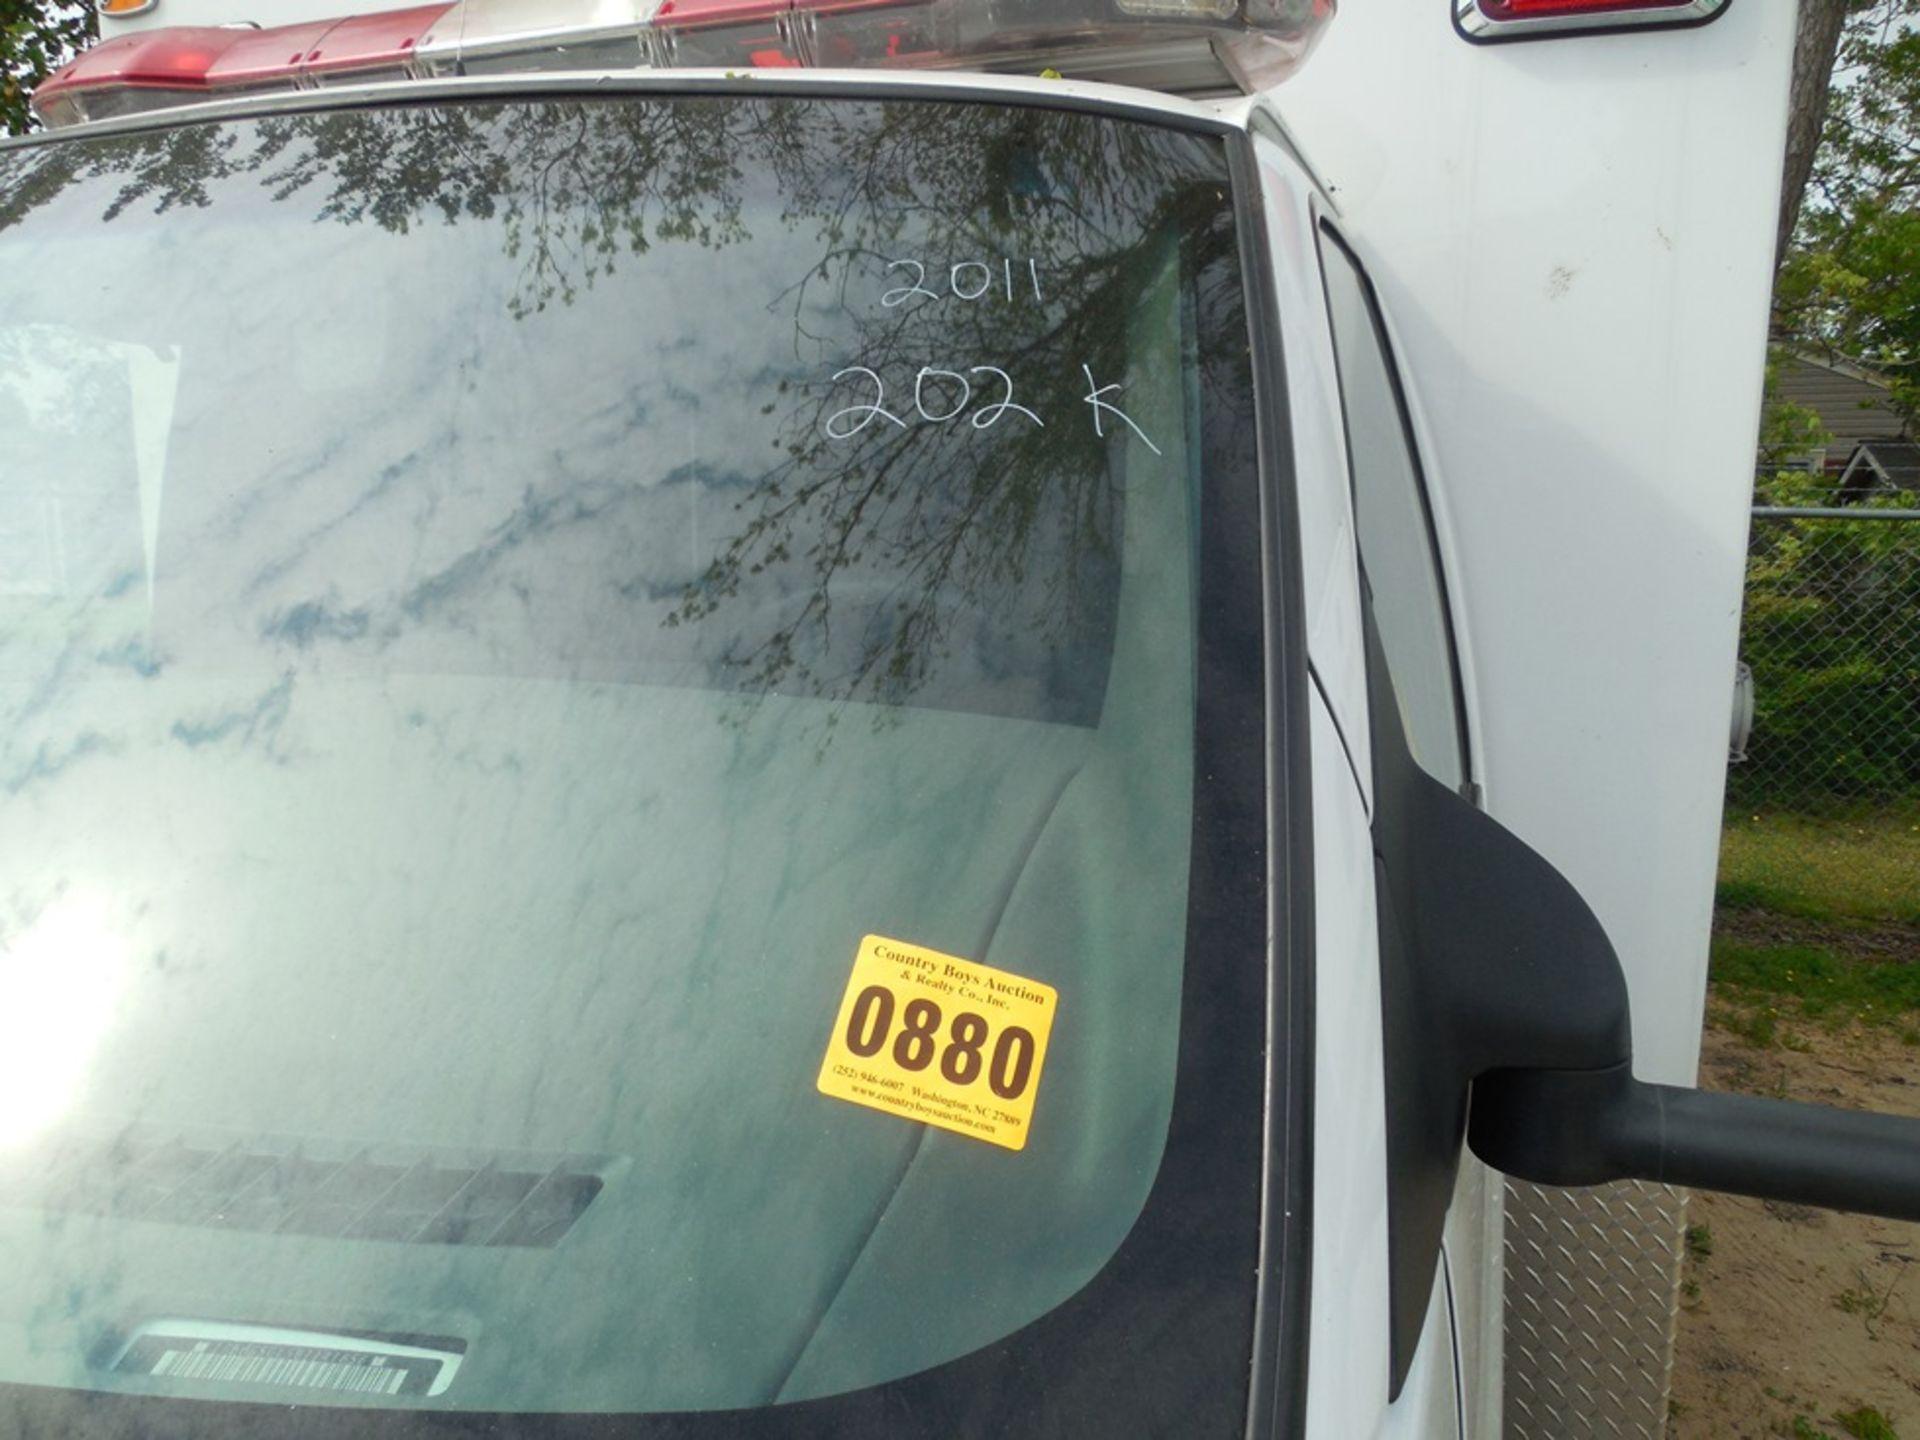 2011 Chev dsl. box ambulance Baun Body 202,680 miles vin# 1GB6G5CL5B1141656